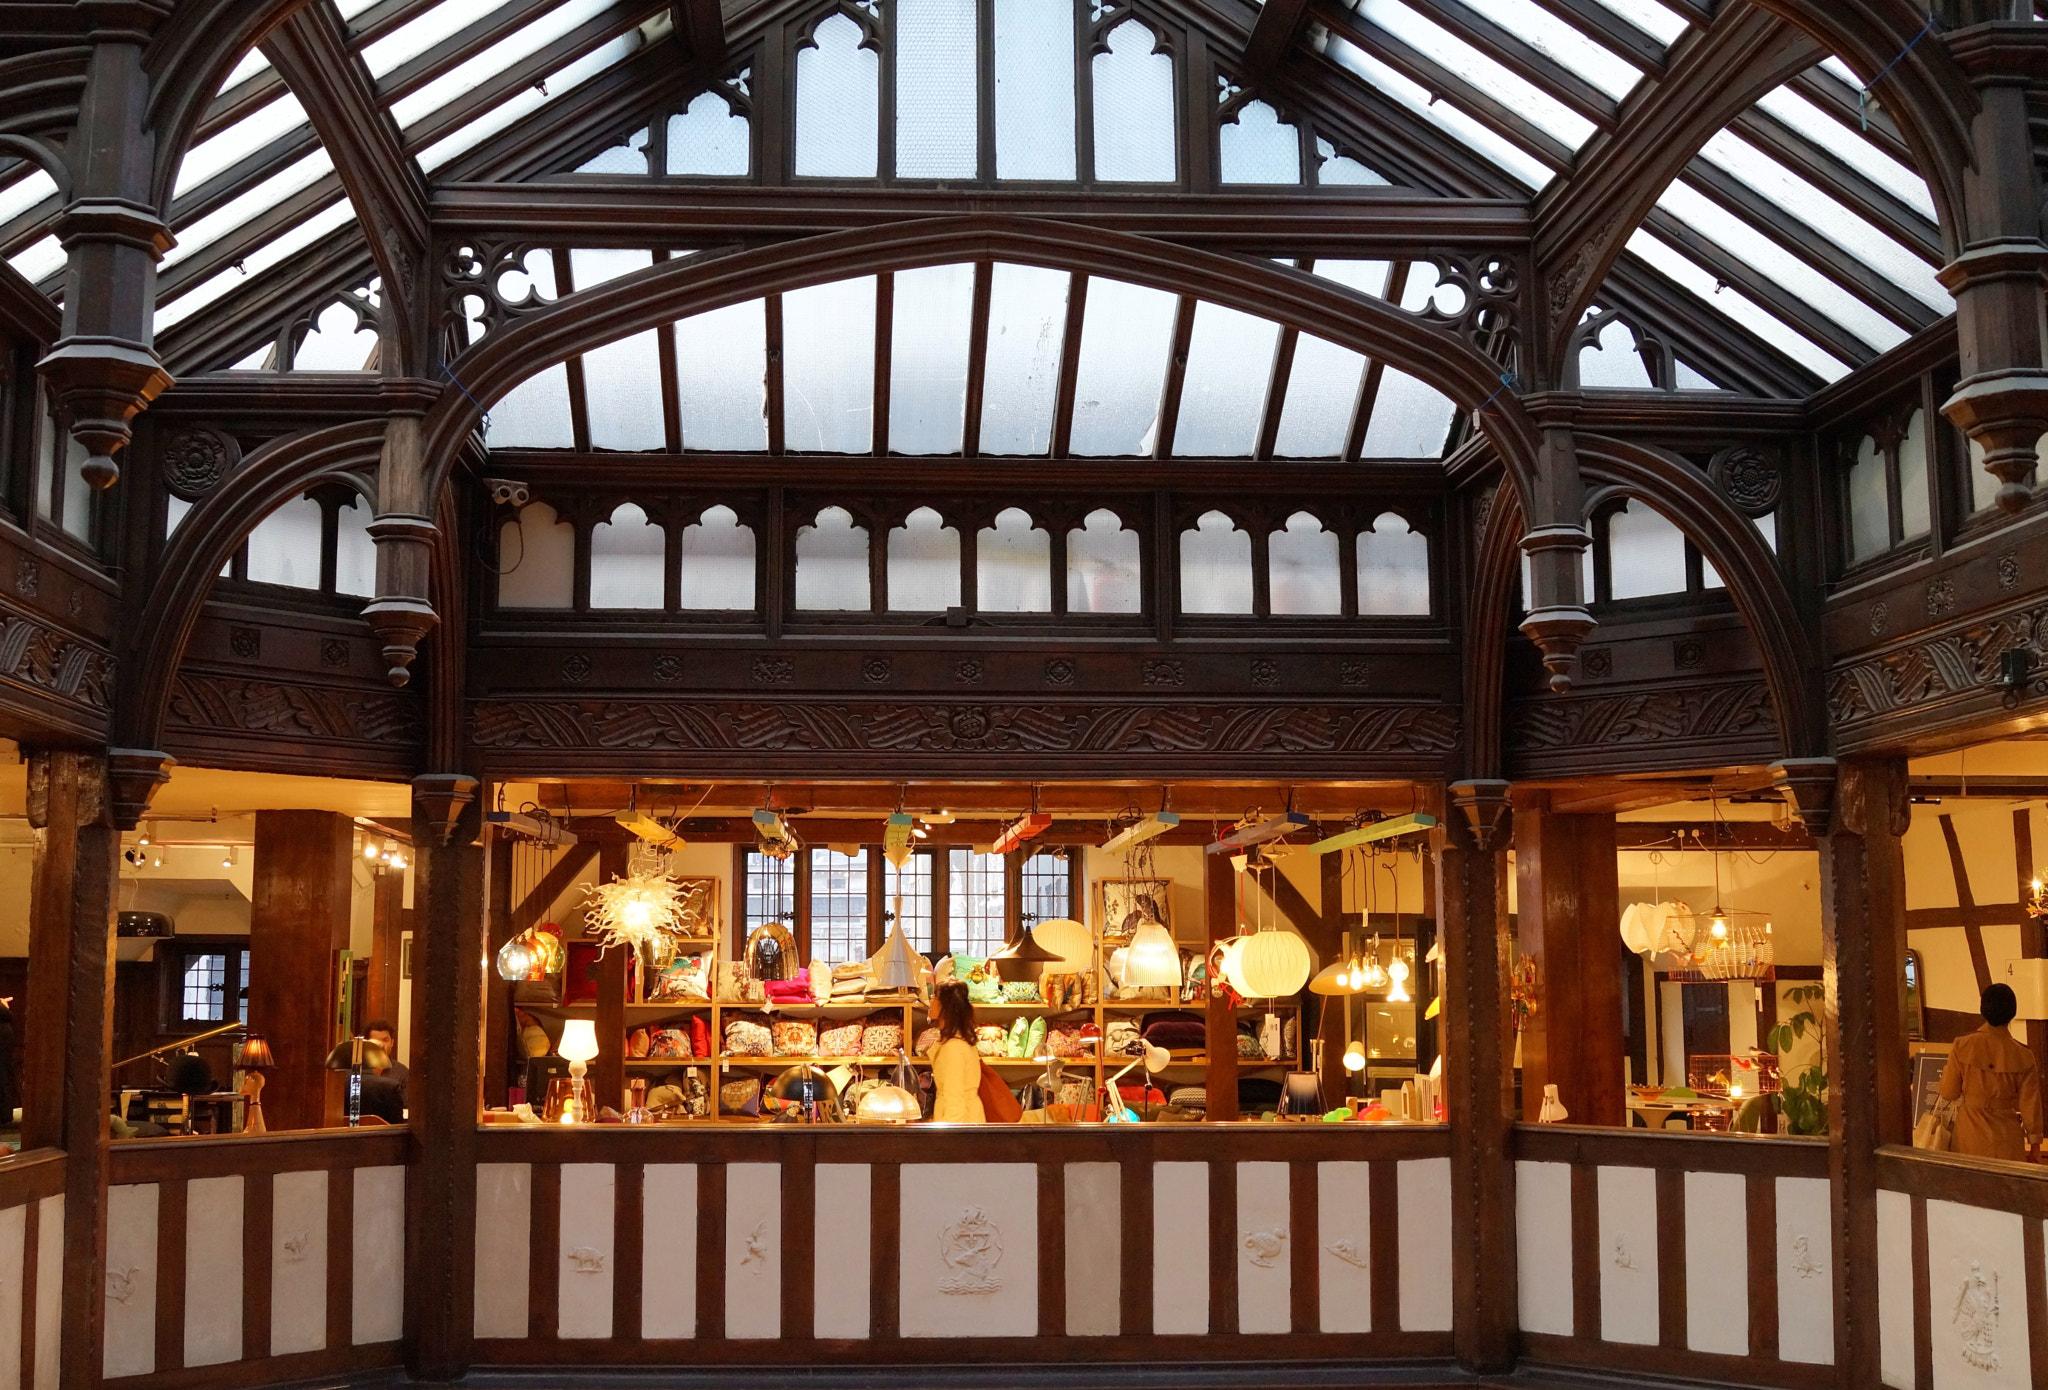 Liberty & Co., Londen. Foto Spindux, winkel, interieur